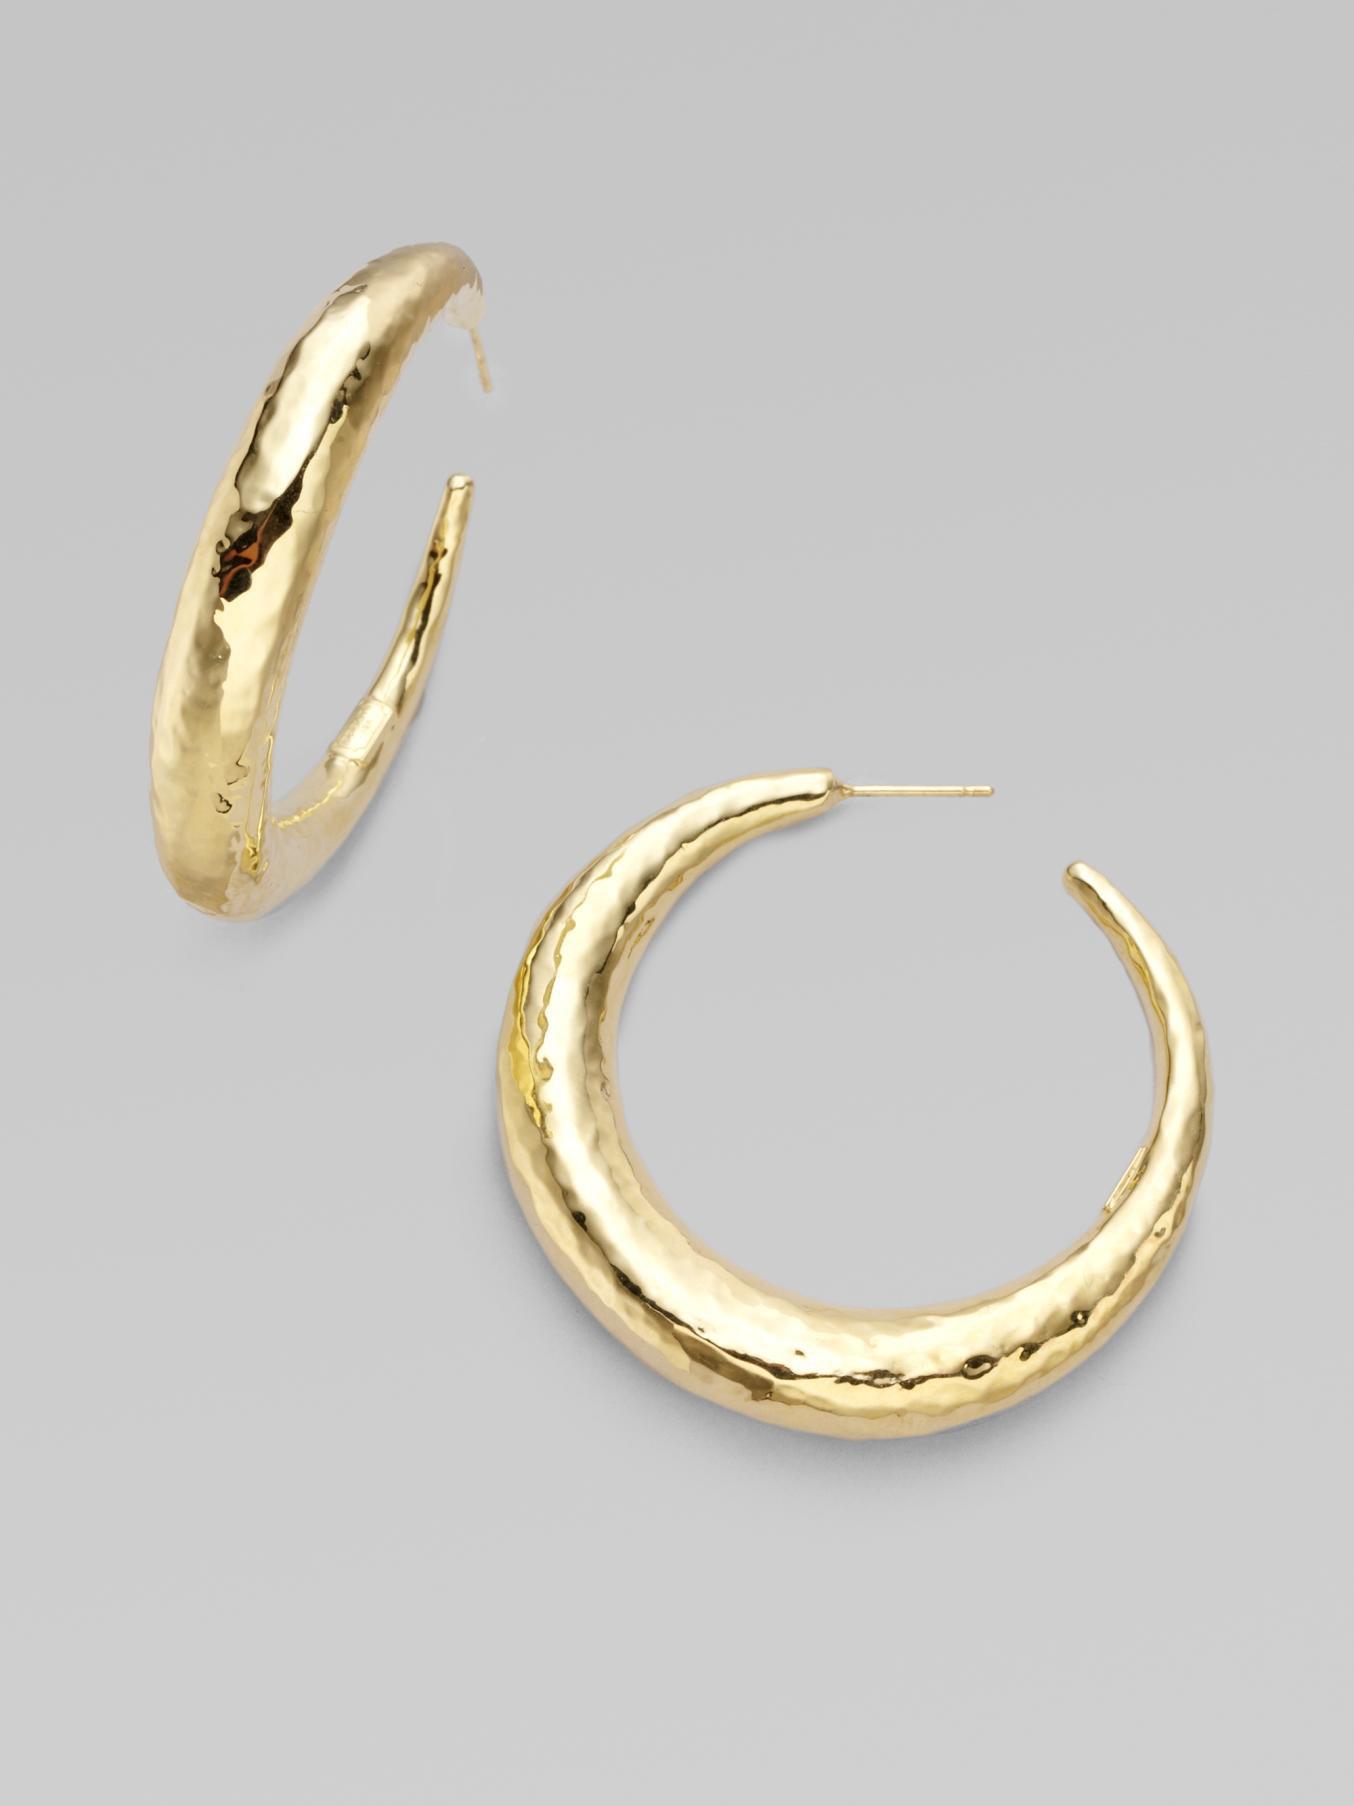 Chunky Gold Hoop Earrings Uk Image Of Earring